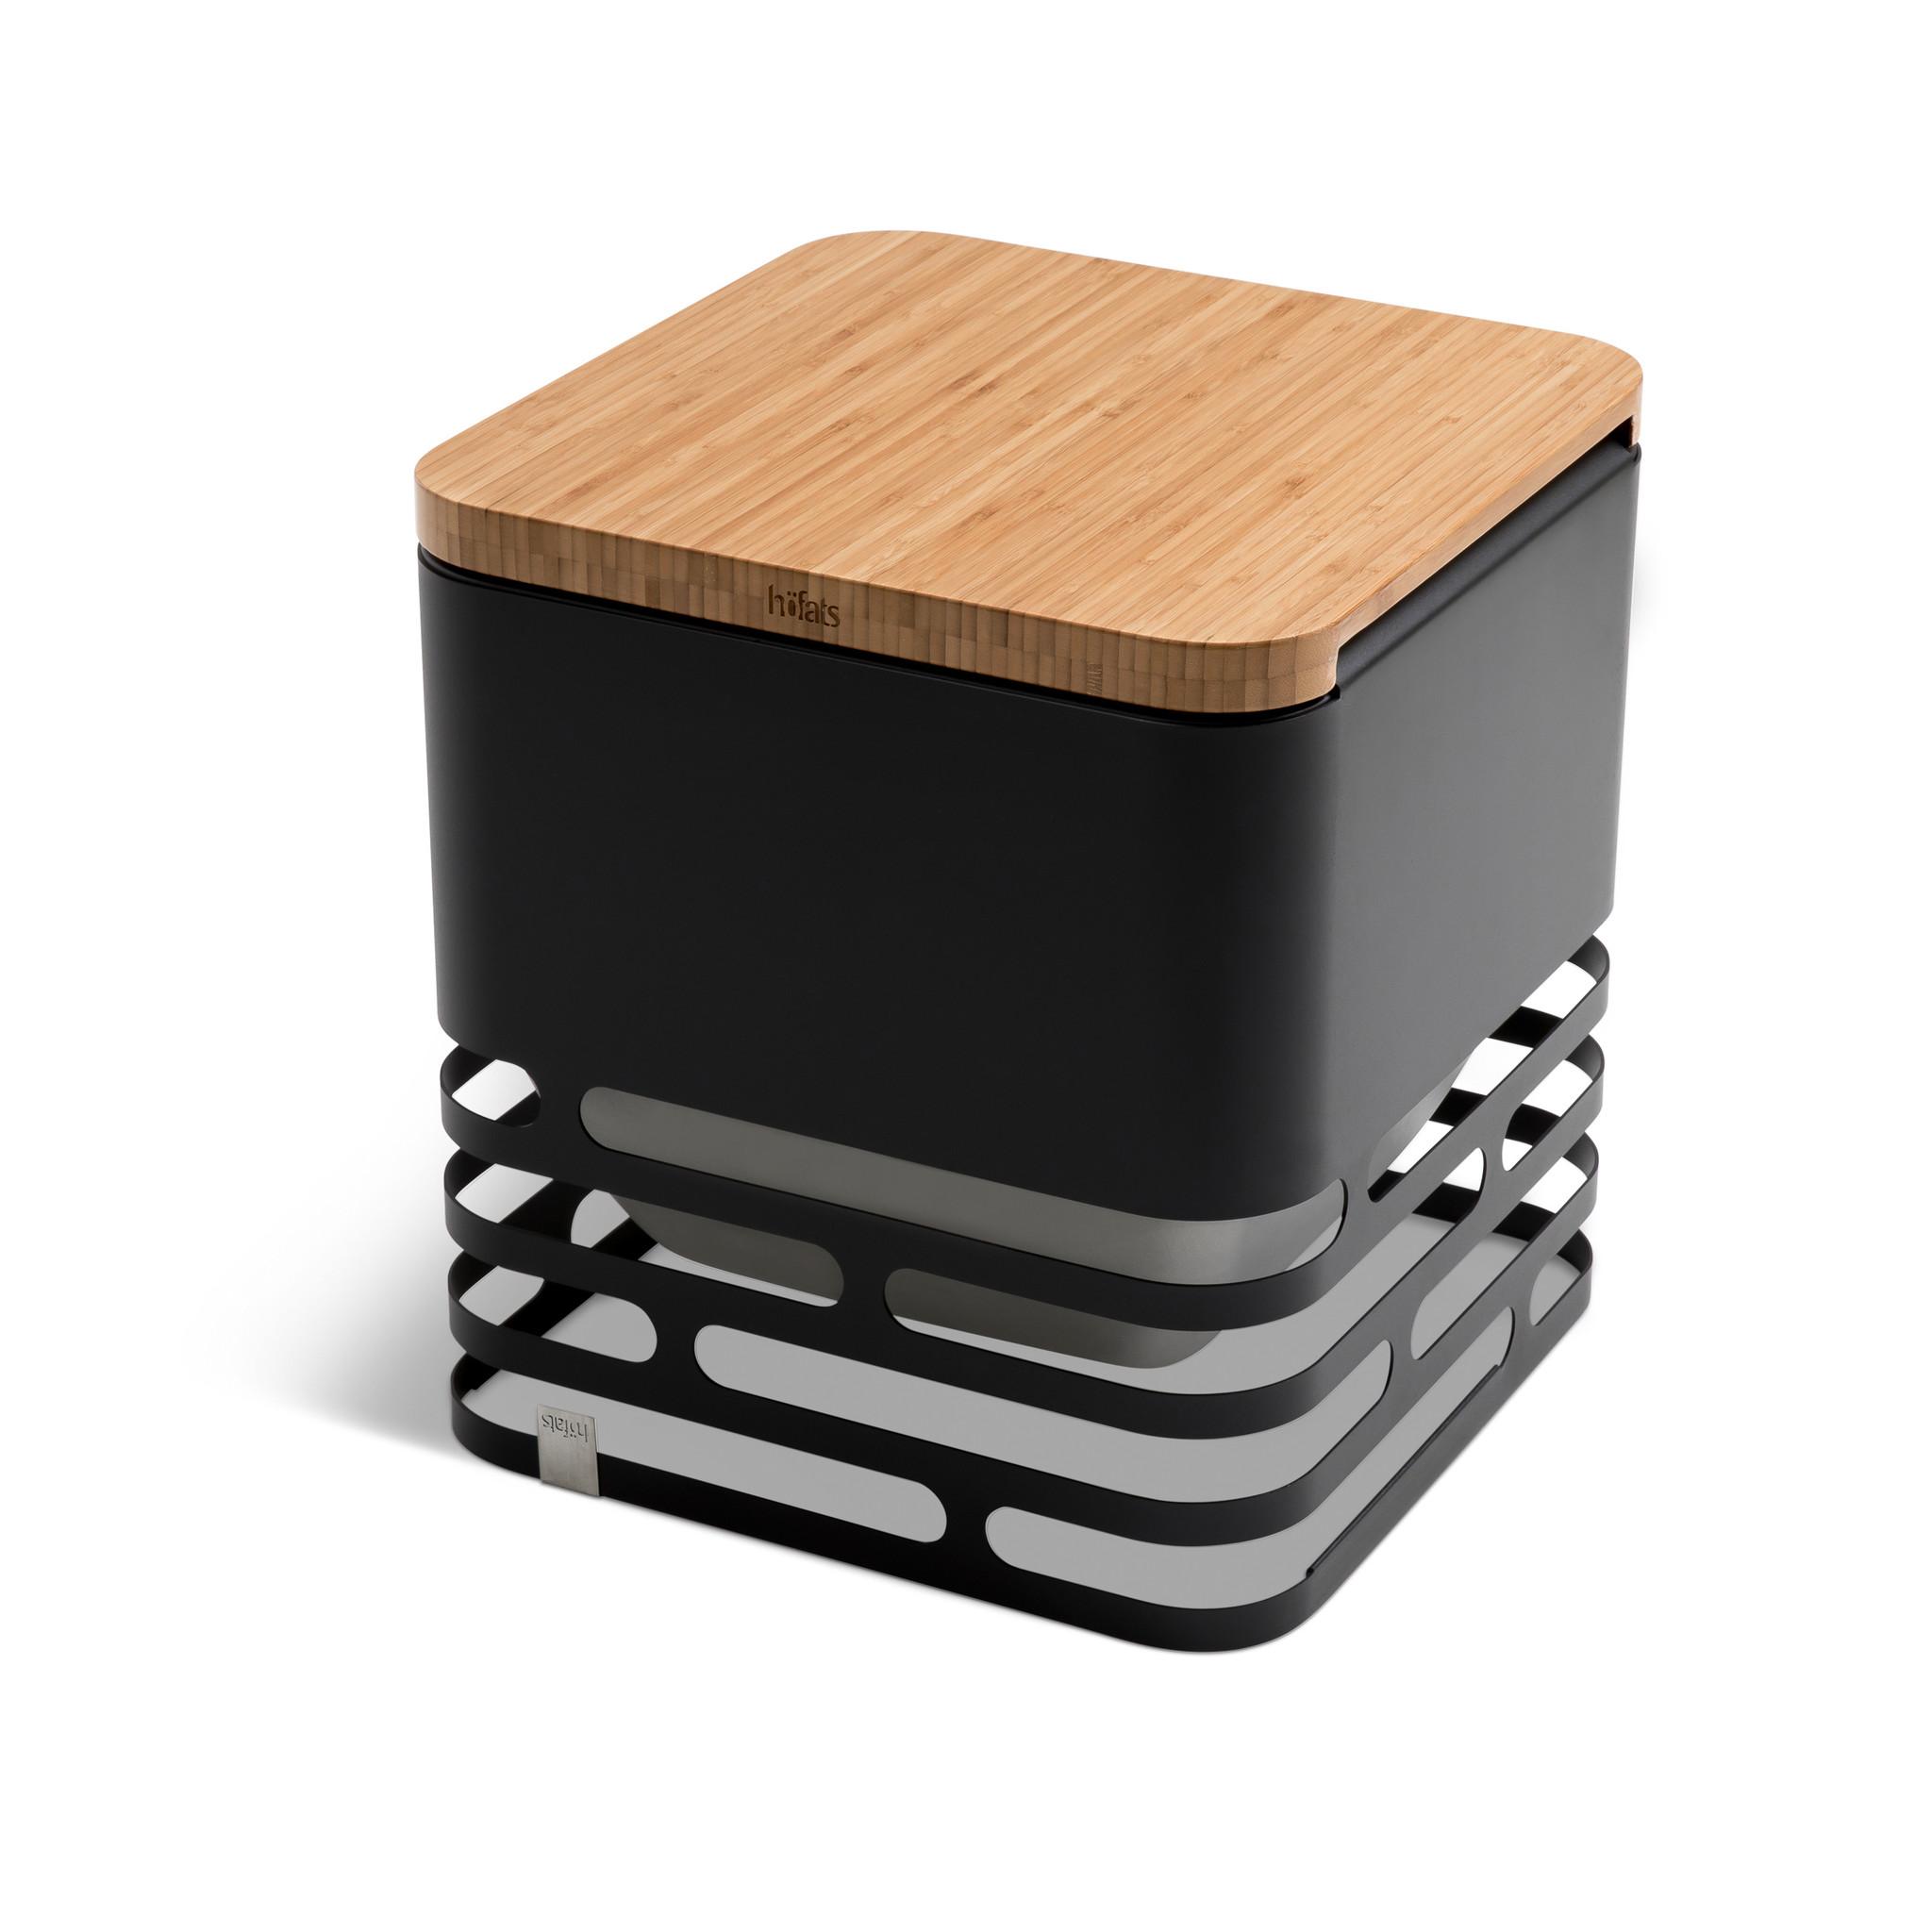 Höfats Cube Board bamboo noir